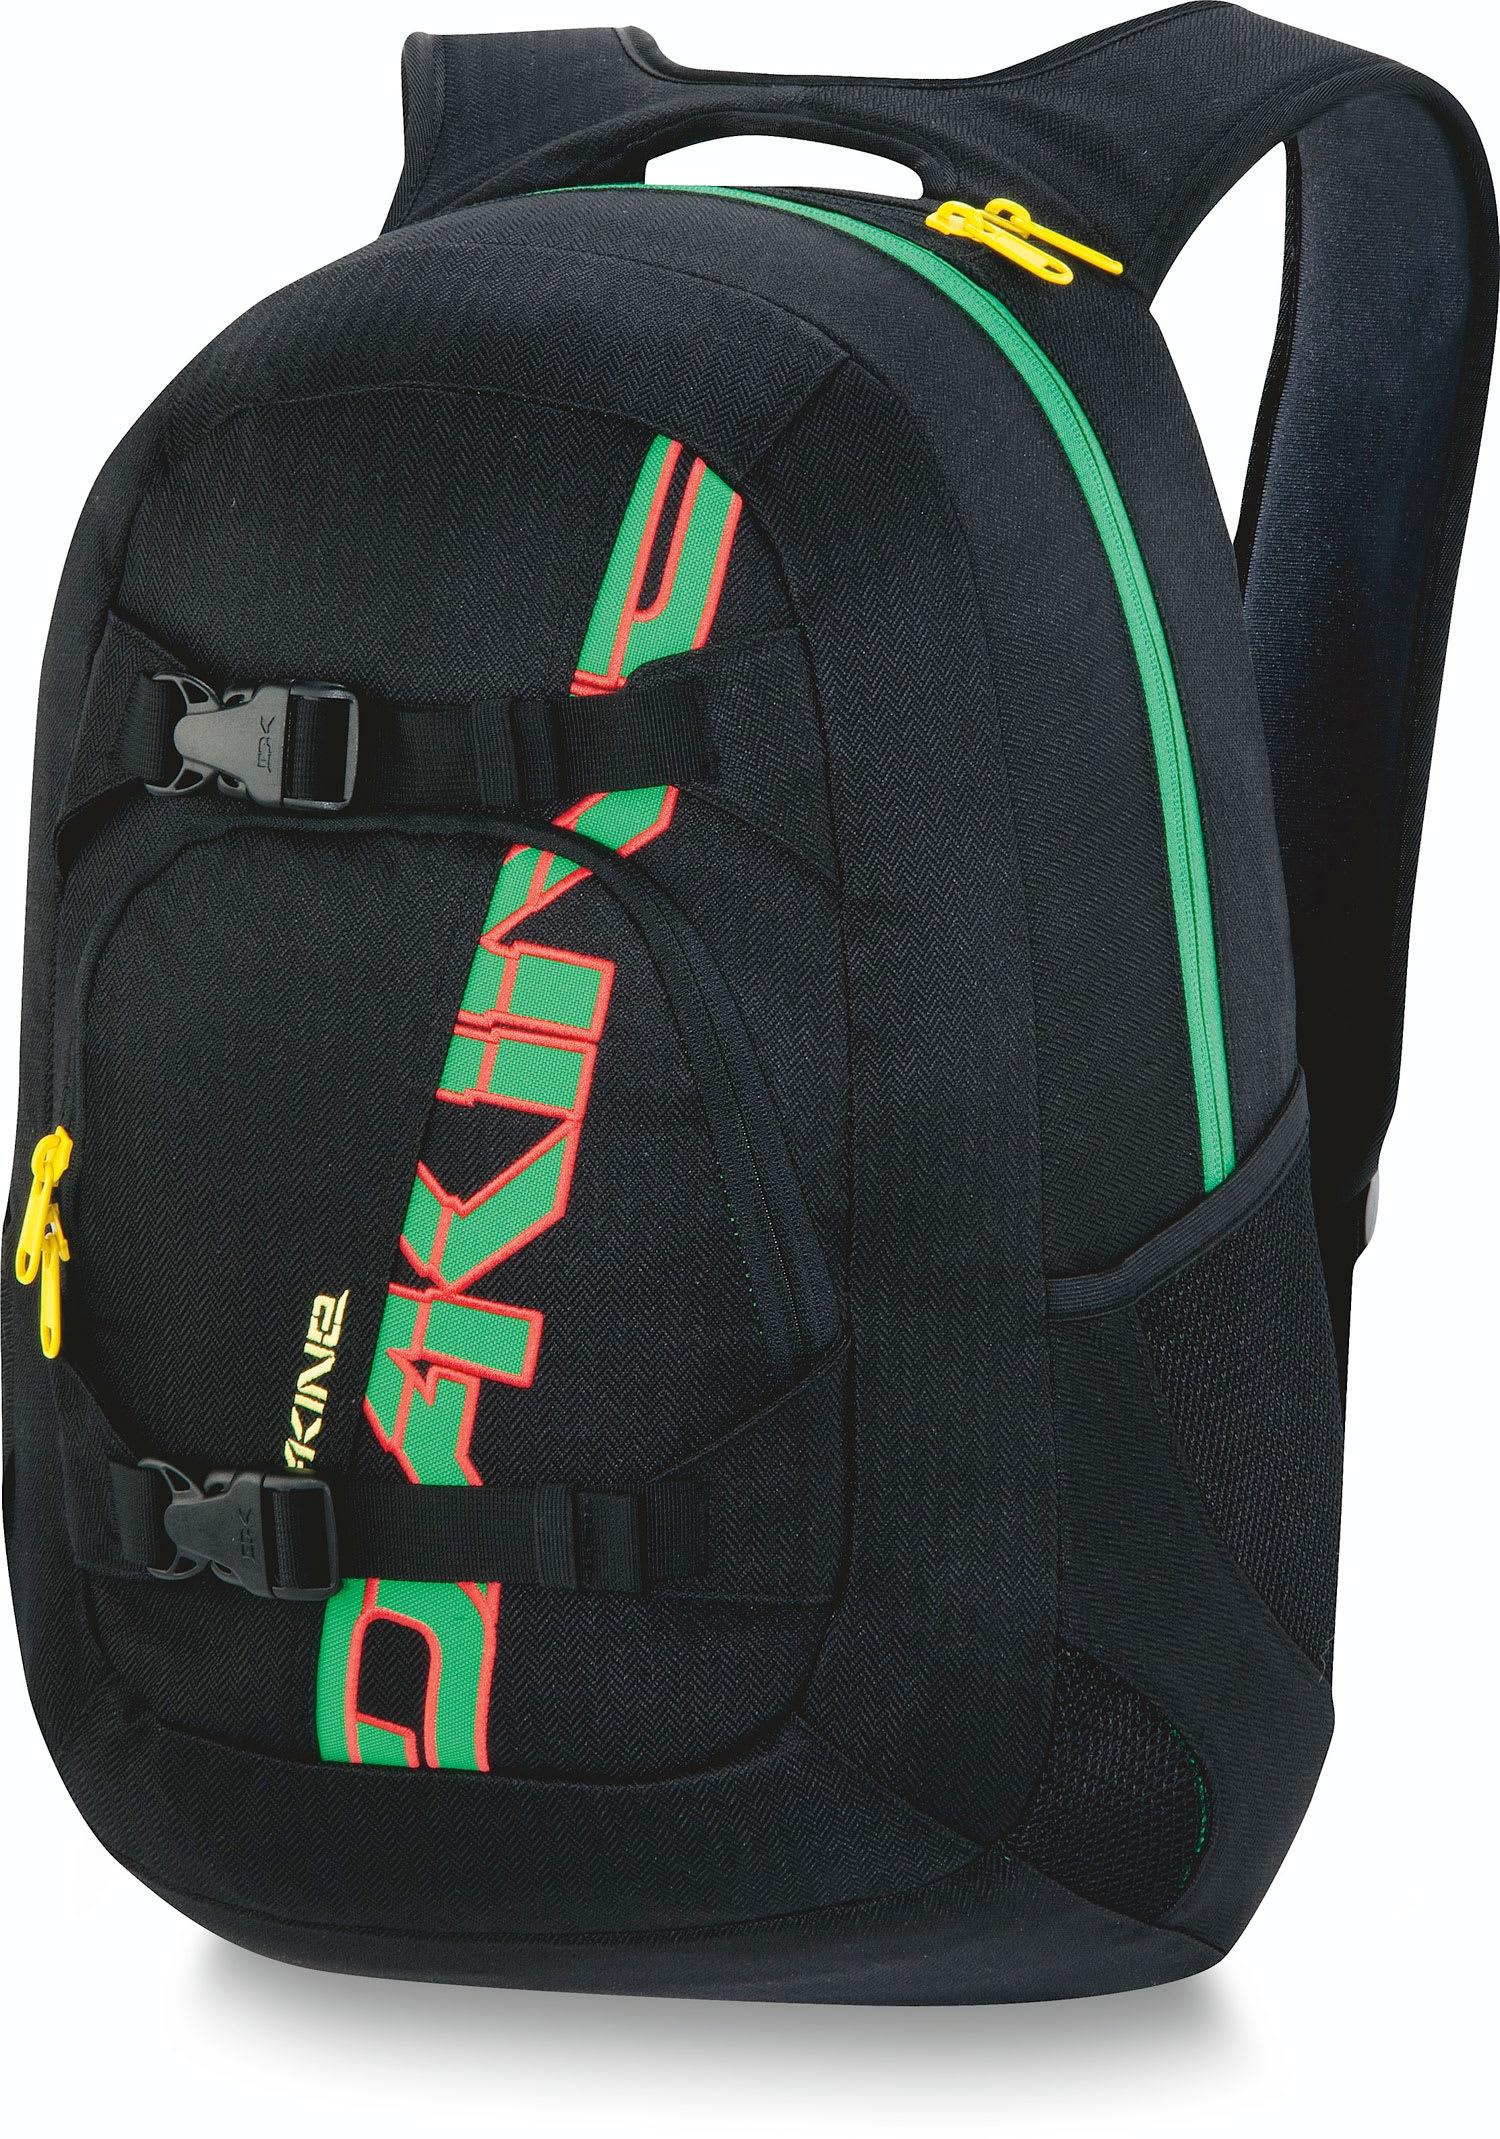 Dakine Explorer 26L Backpack Black/Rasta